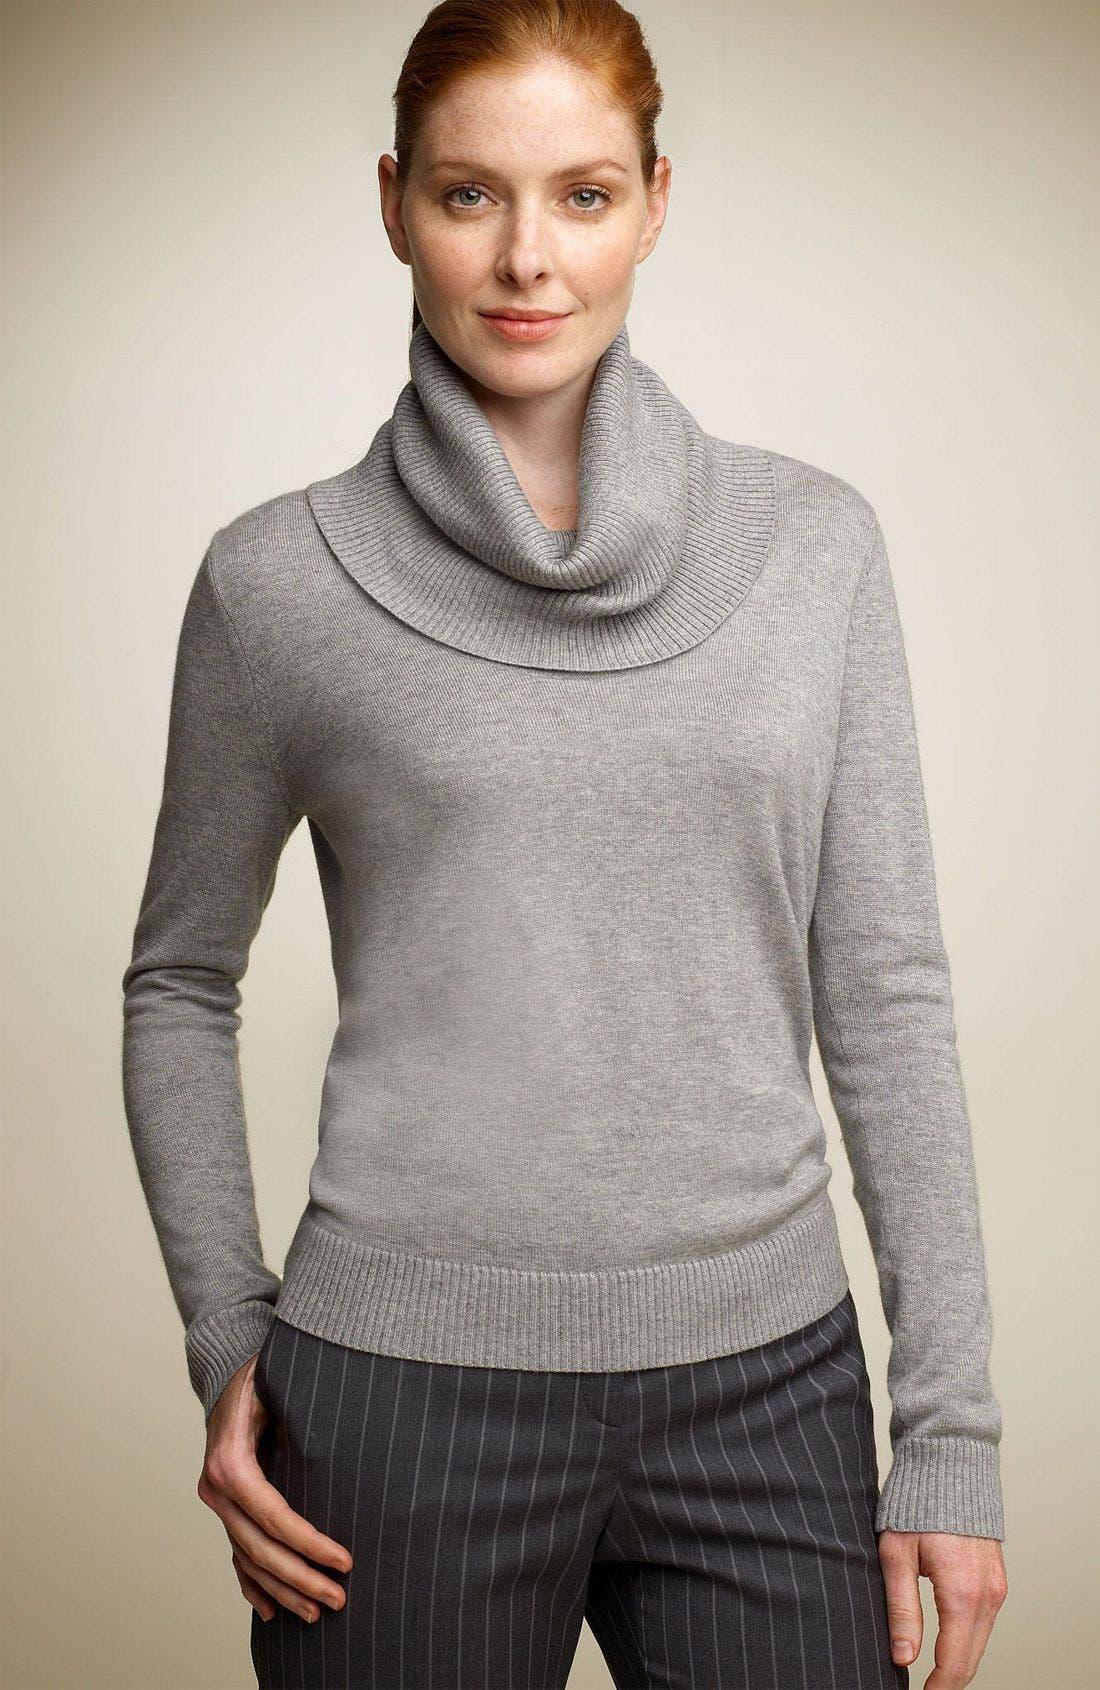 Alternate Image 1 Selected - Façonnable Draped Turtleneck Sweater